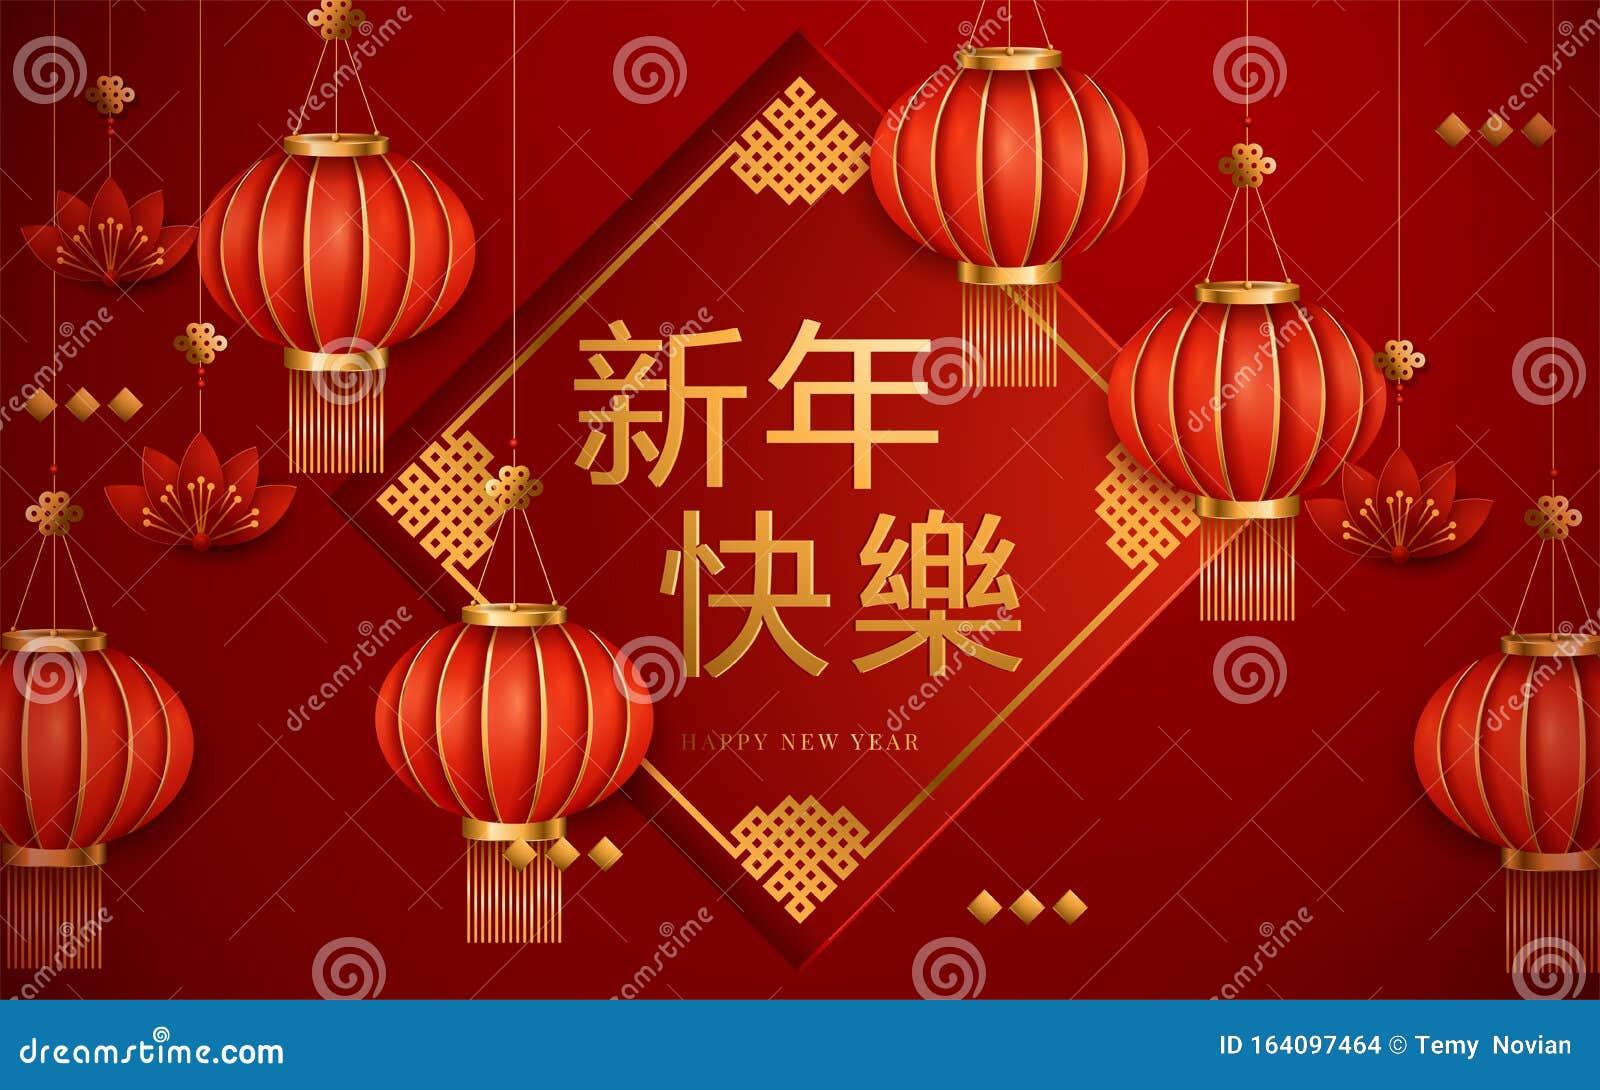 Paper Art Lanterns Decoration For Lunar Year Banner Red ...